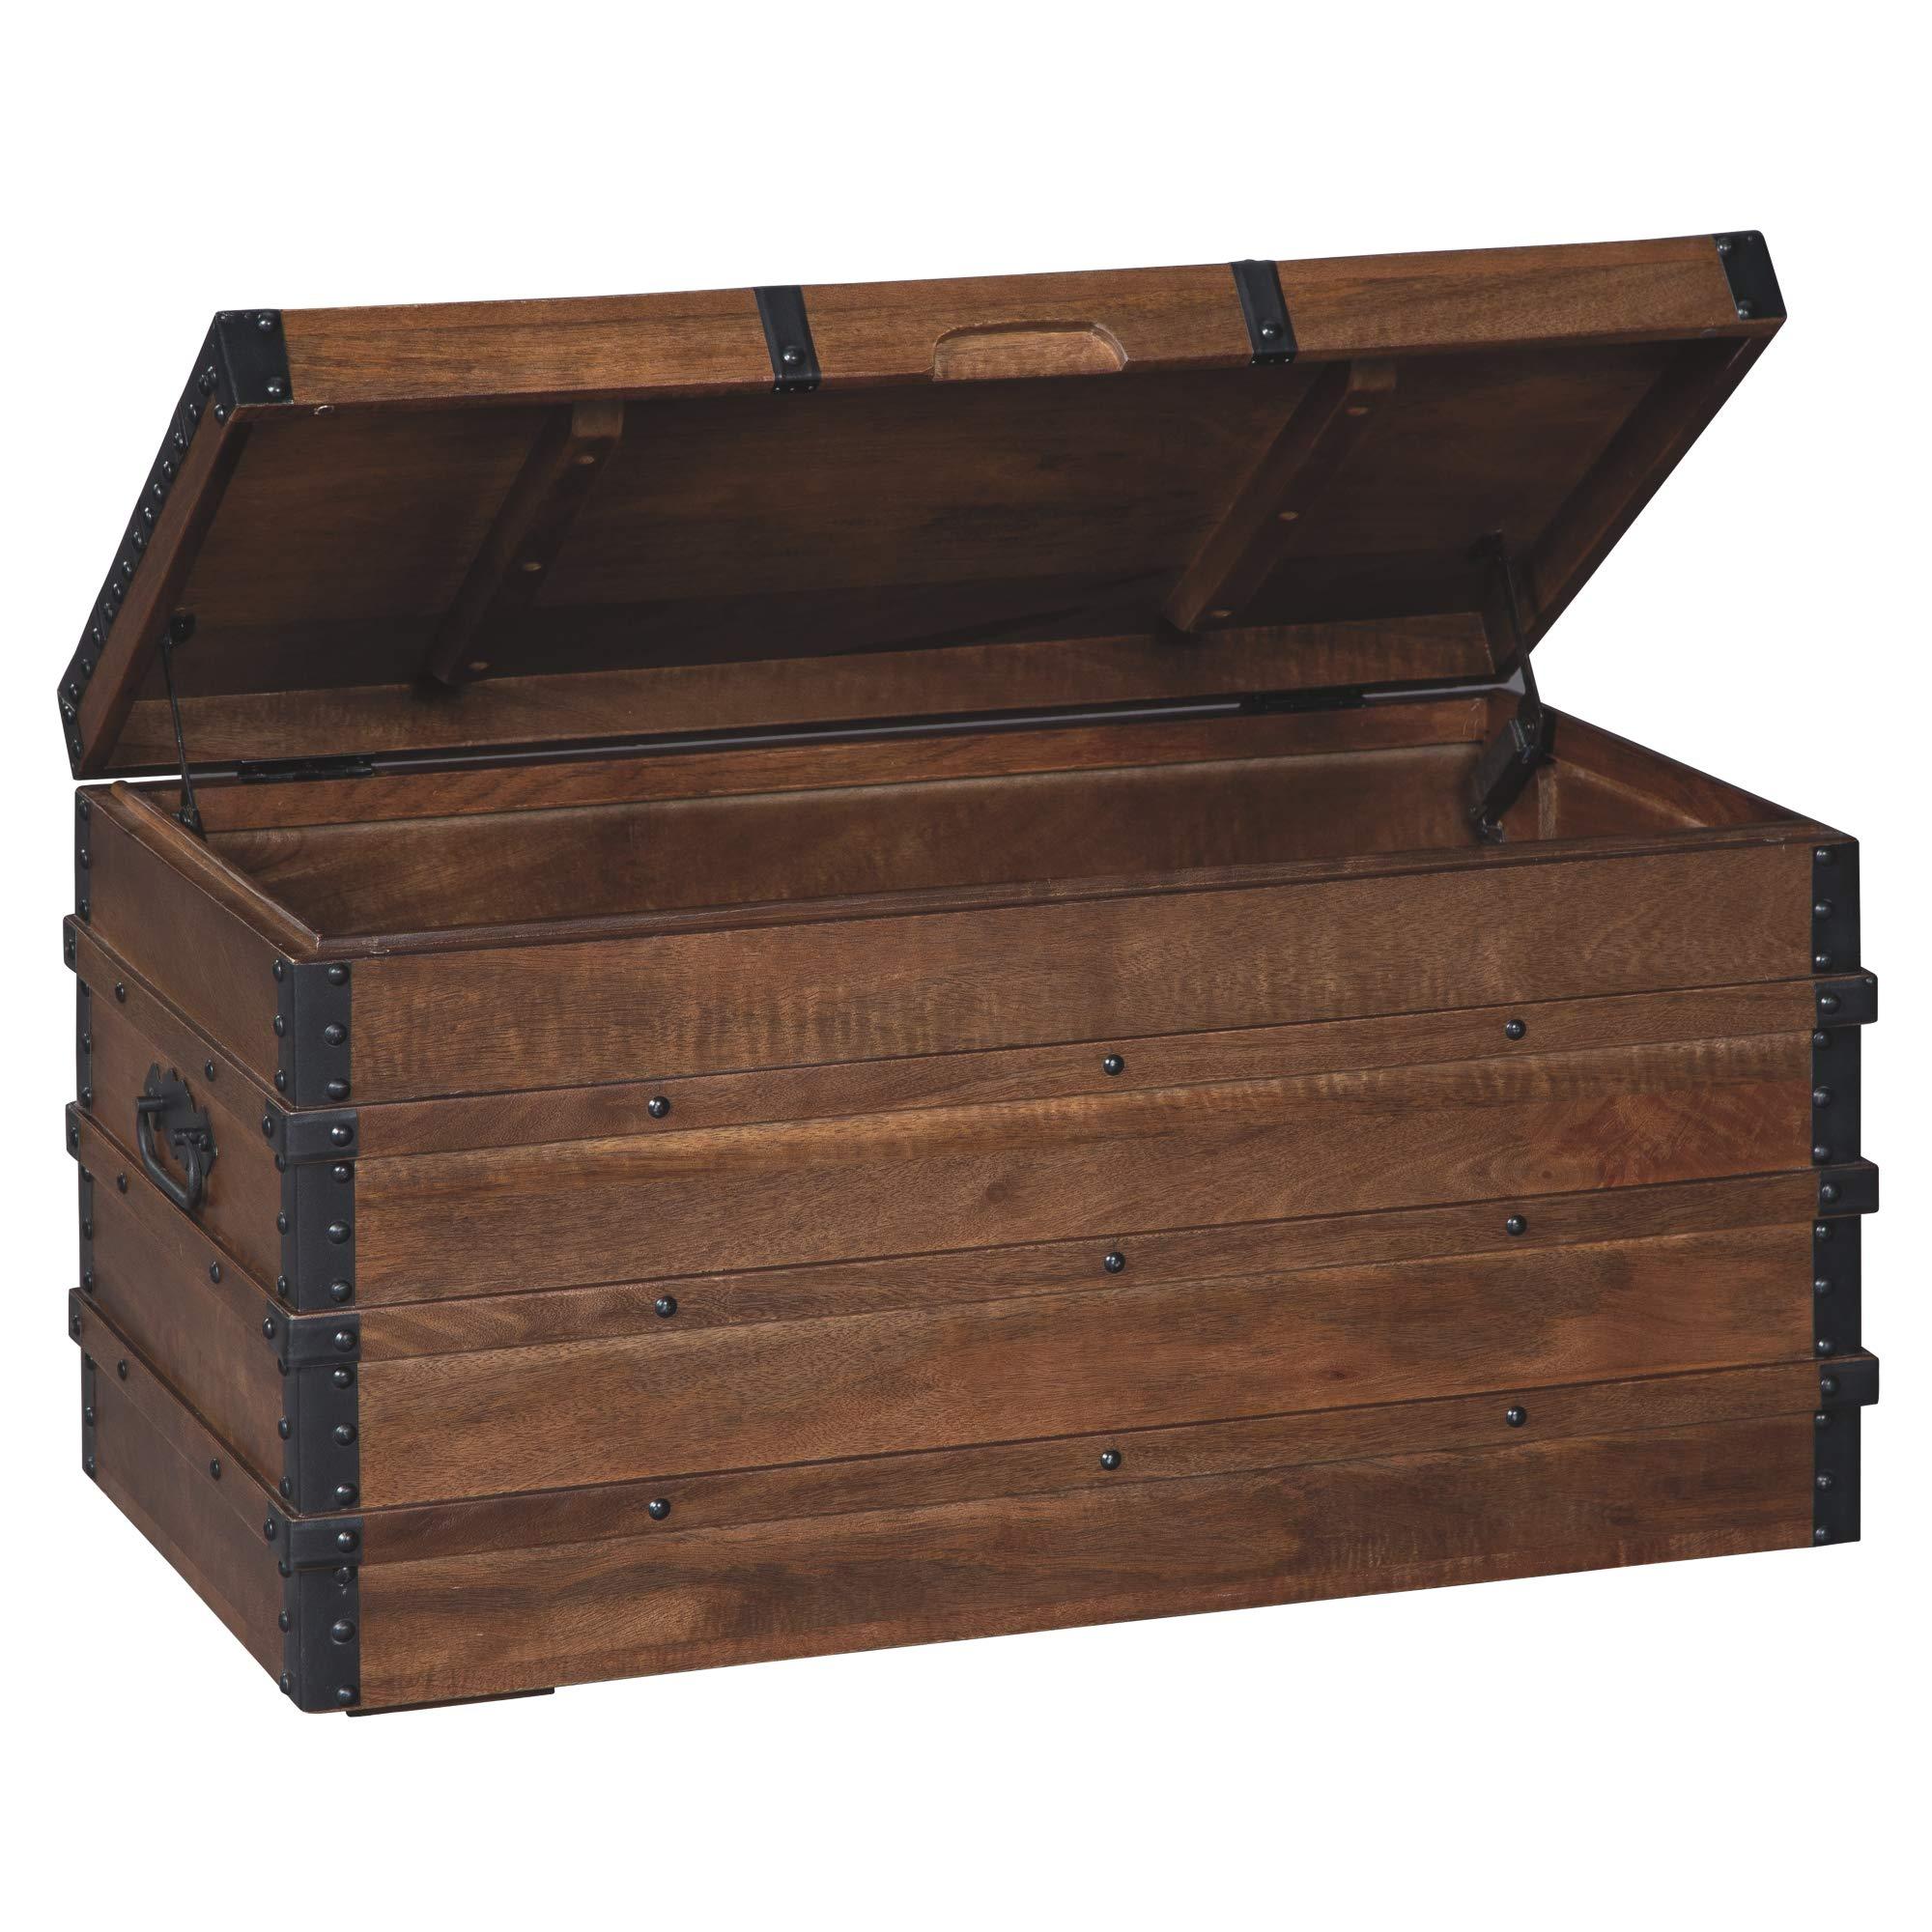 Ashley Furniture Signature Design - Kettleby Storage Trunk - Brown by Ashley Furniture Signature Design